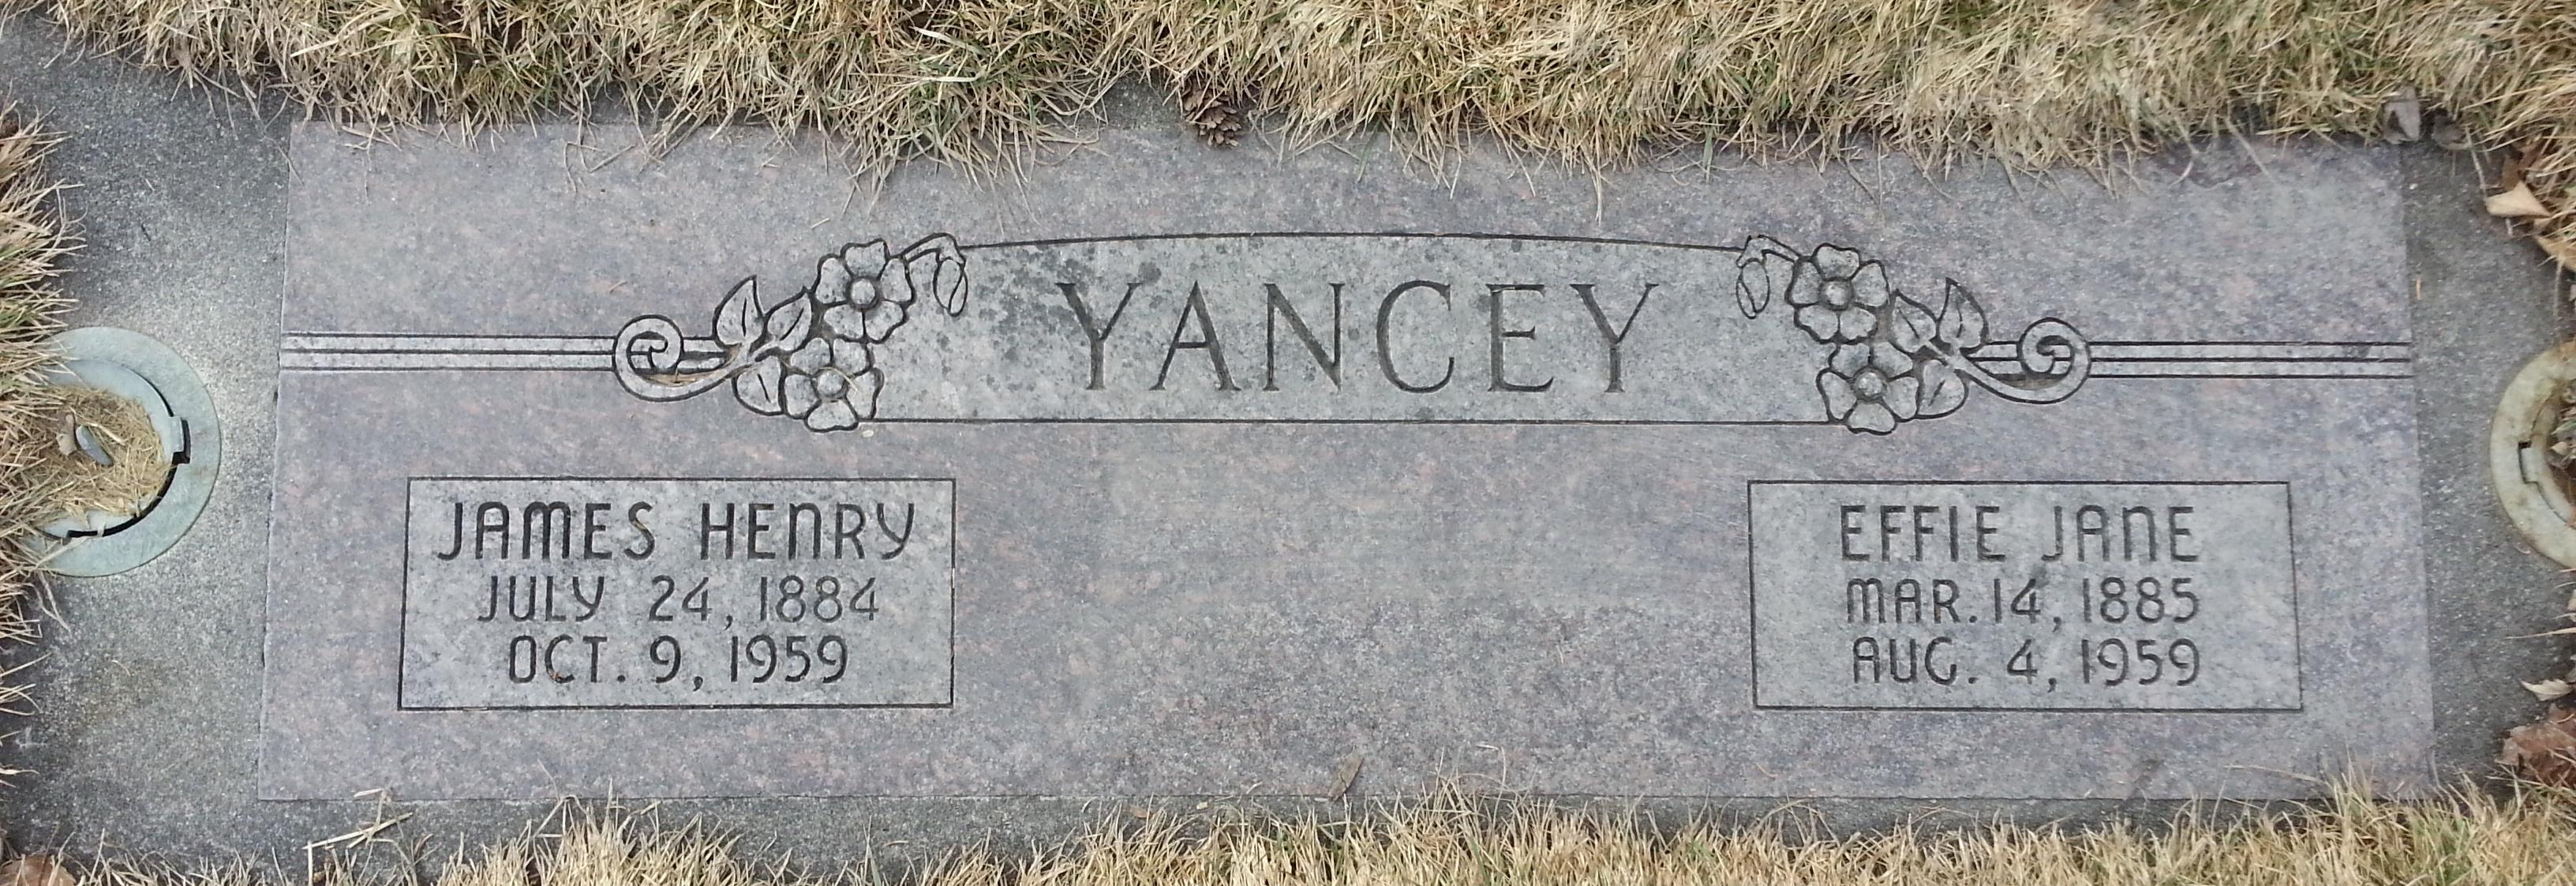 James Henry Yancey